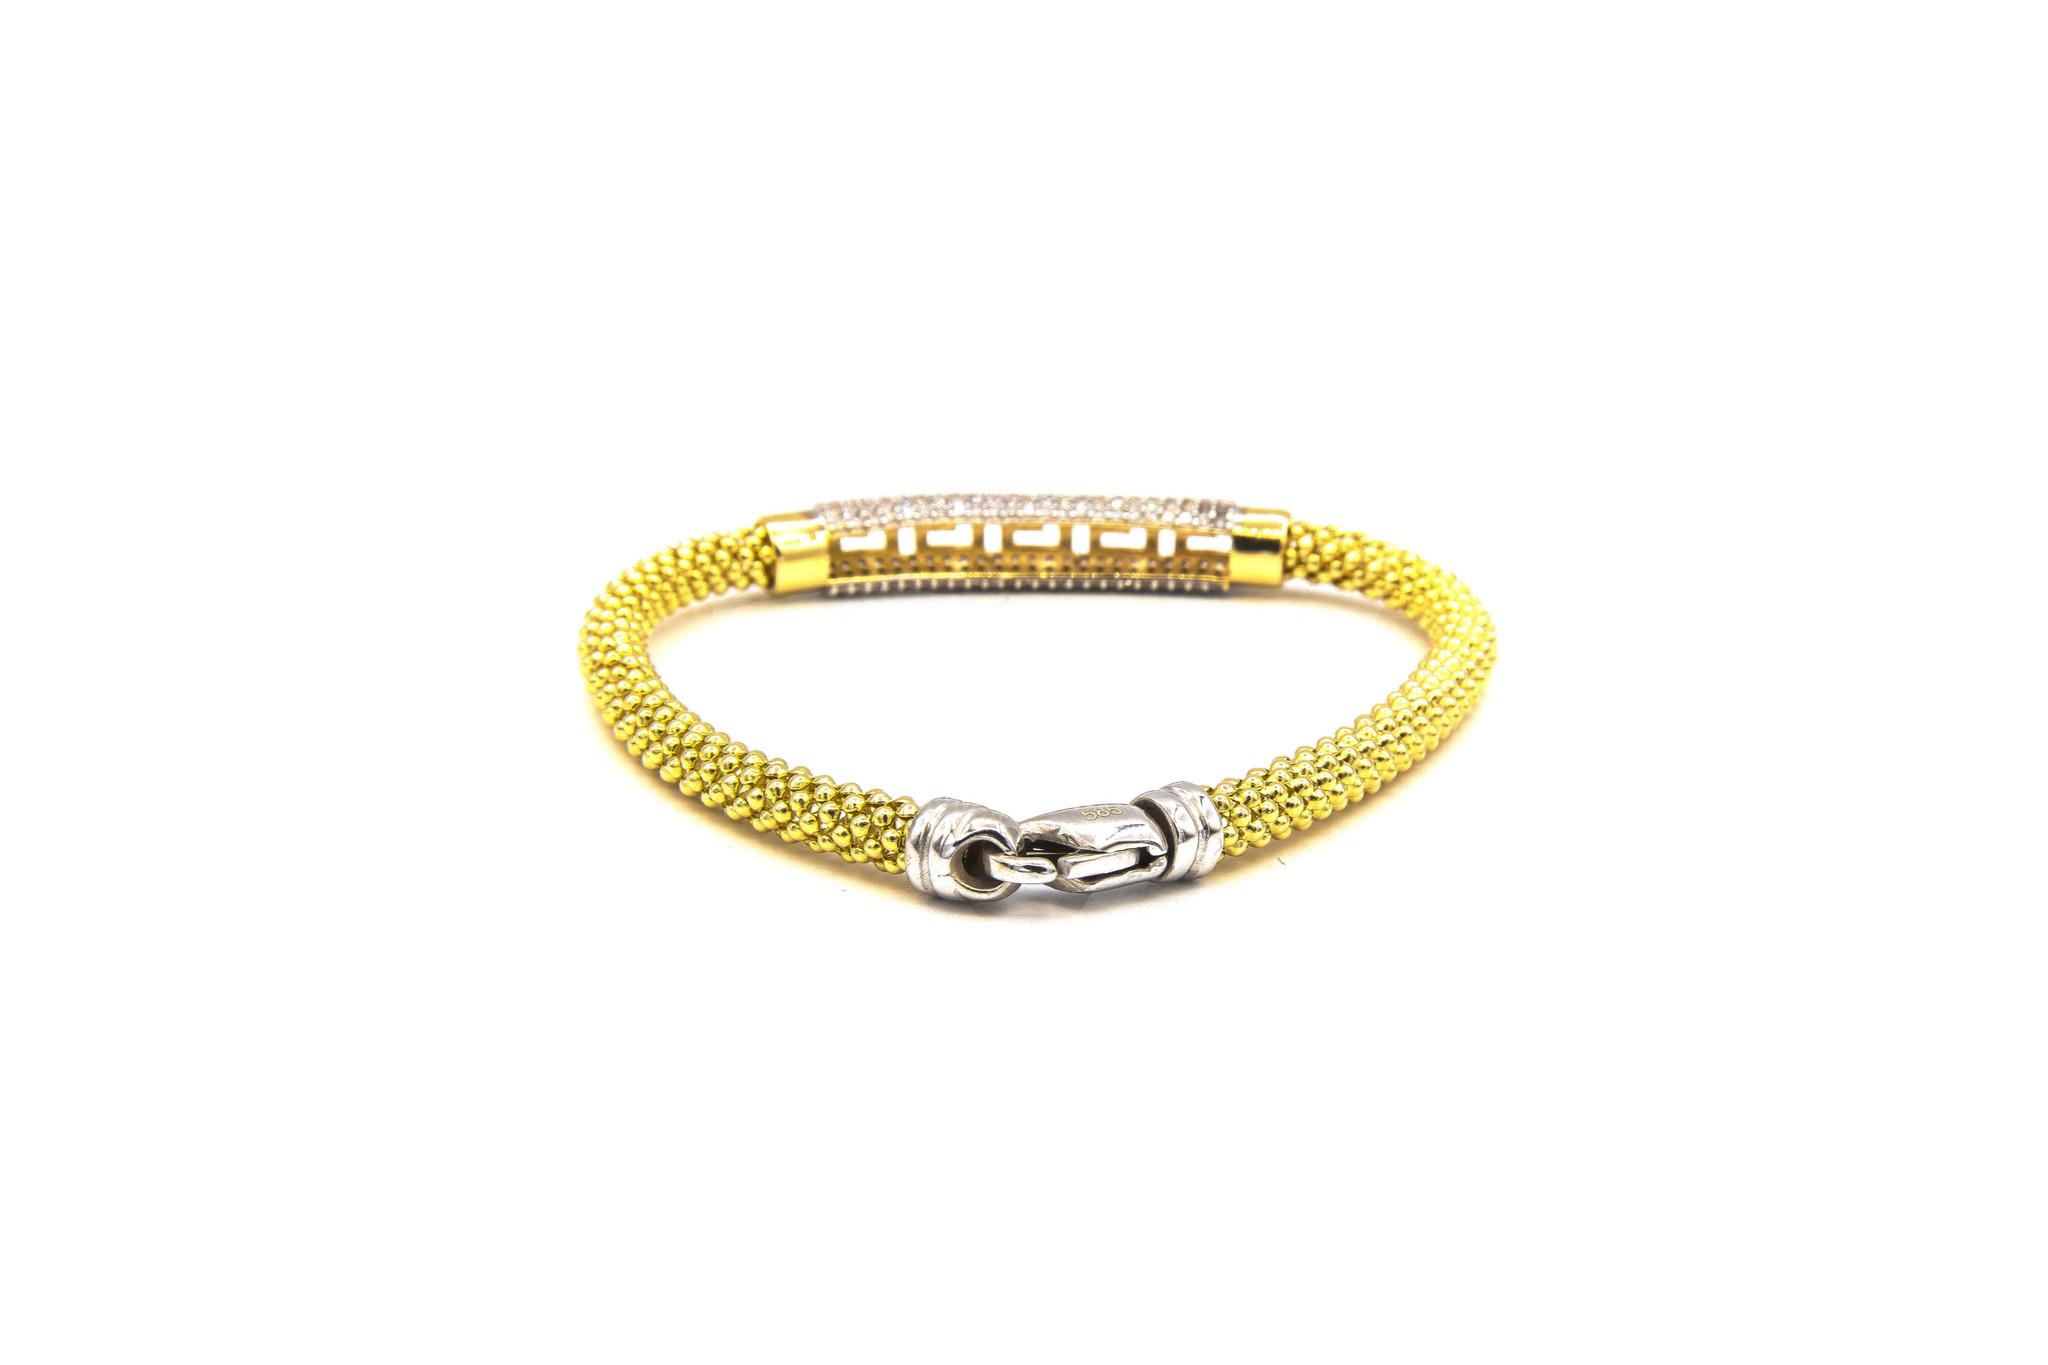 Armband halve slavenband versace met zirkonia's en flexibele boto ketti-5